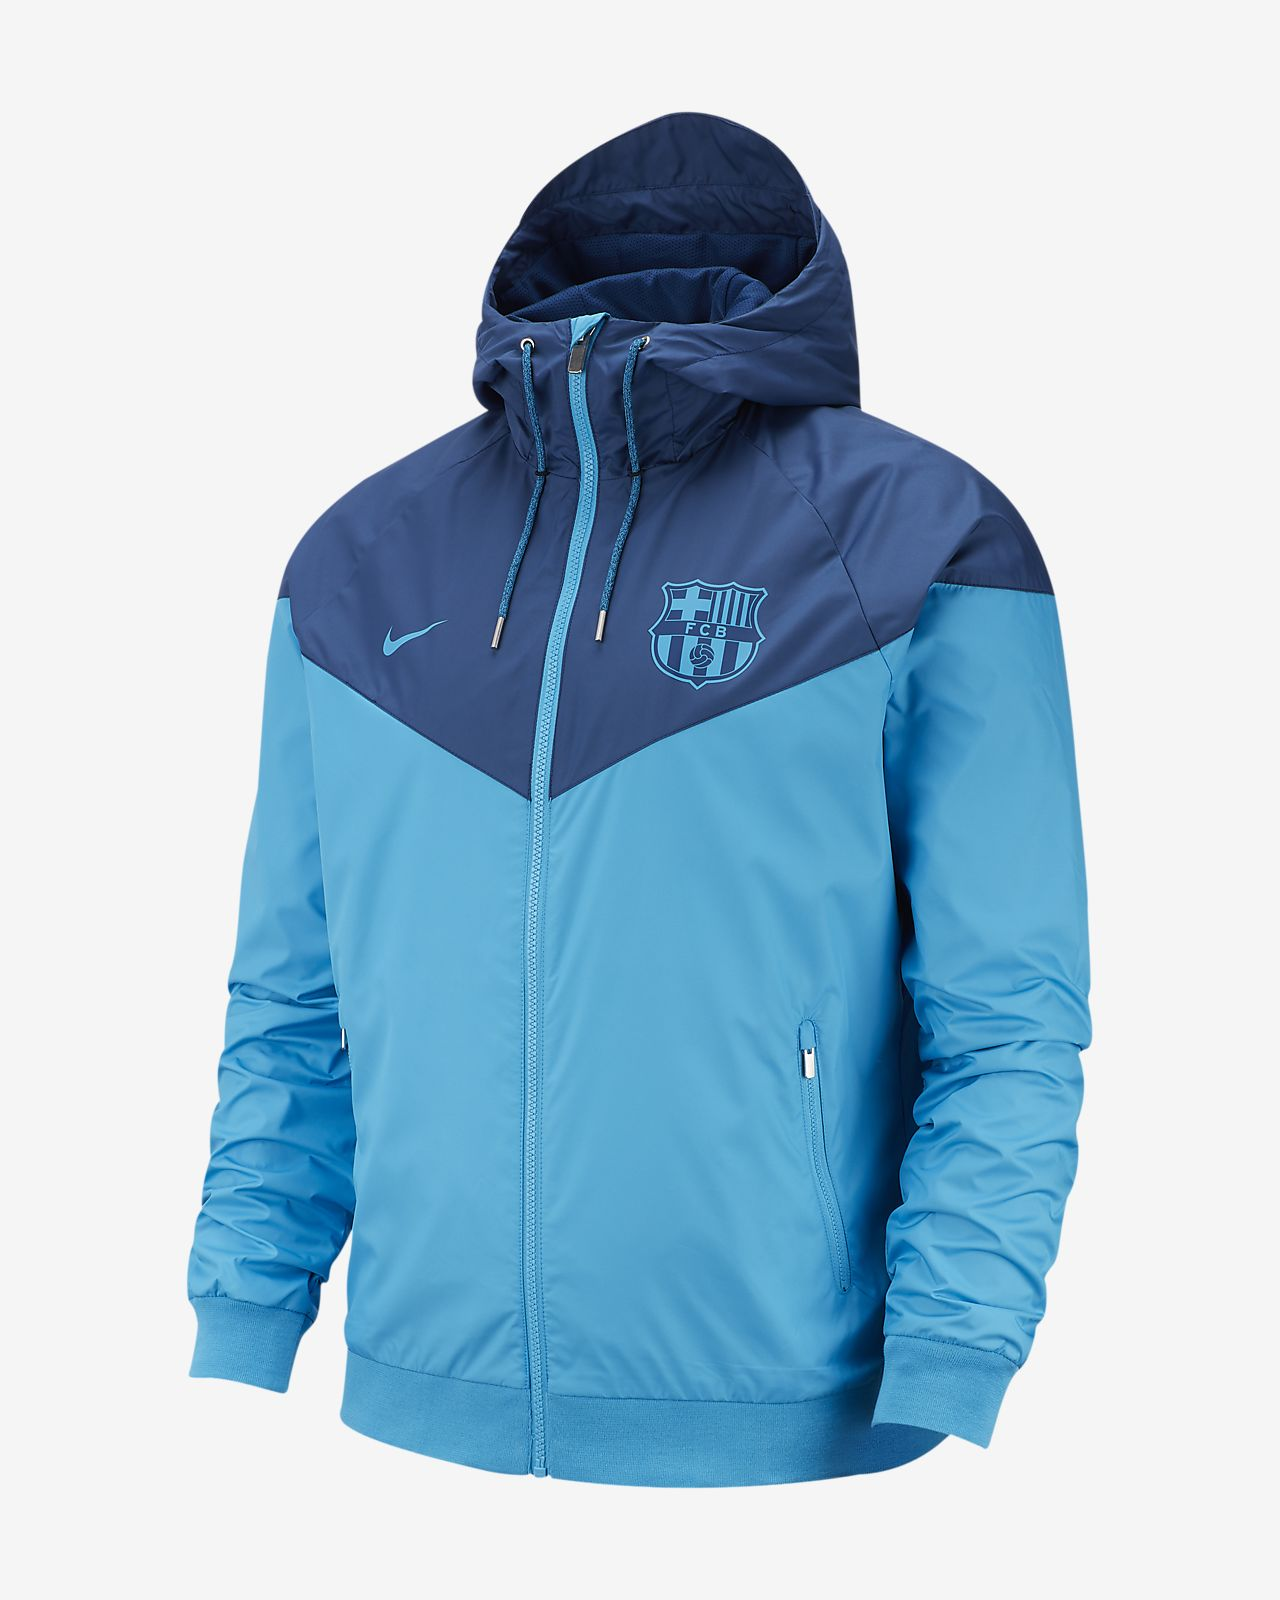 e1b4471f2e014 FC Barcelona Windrunner Chaqueta - Hombre. Nike.com ES